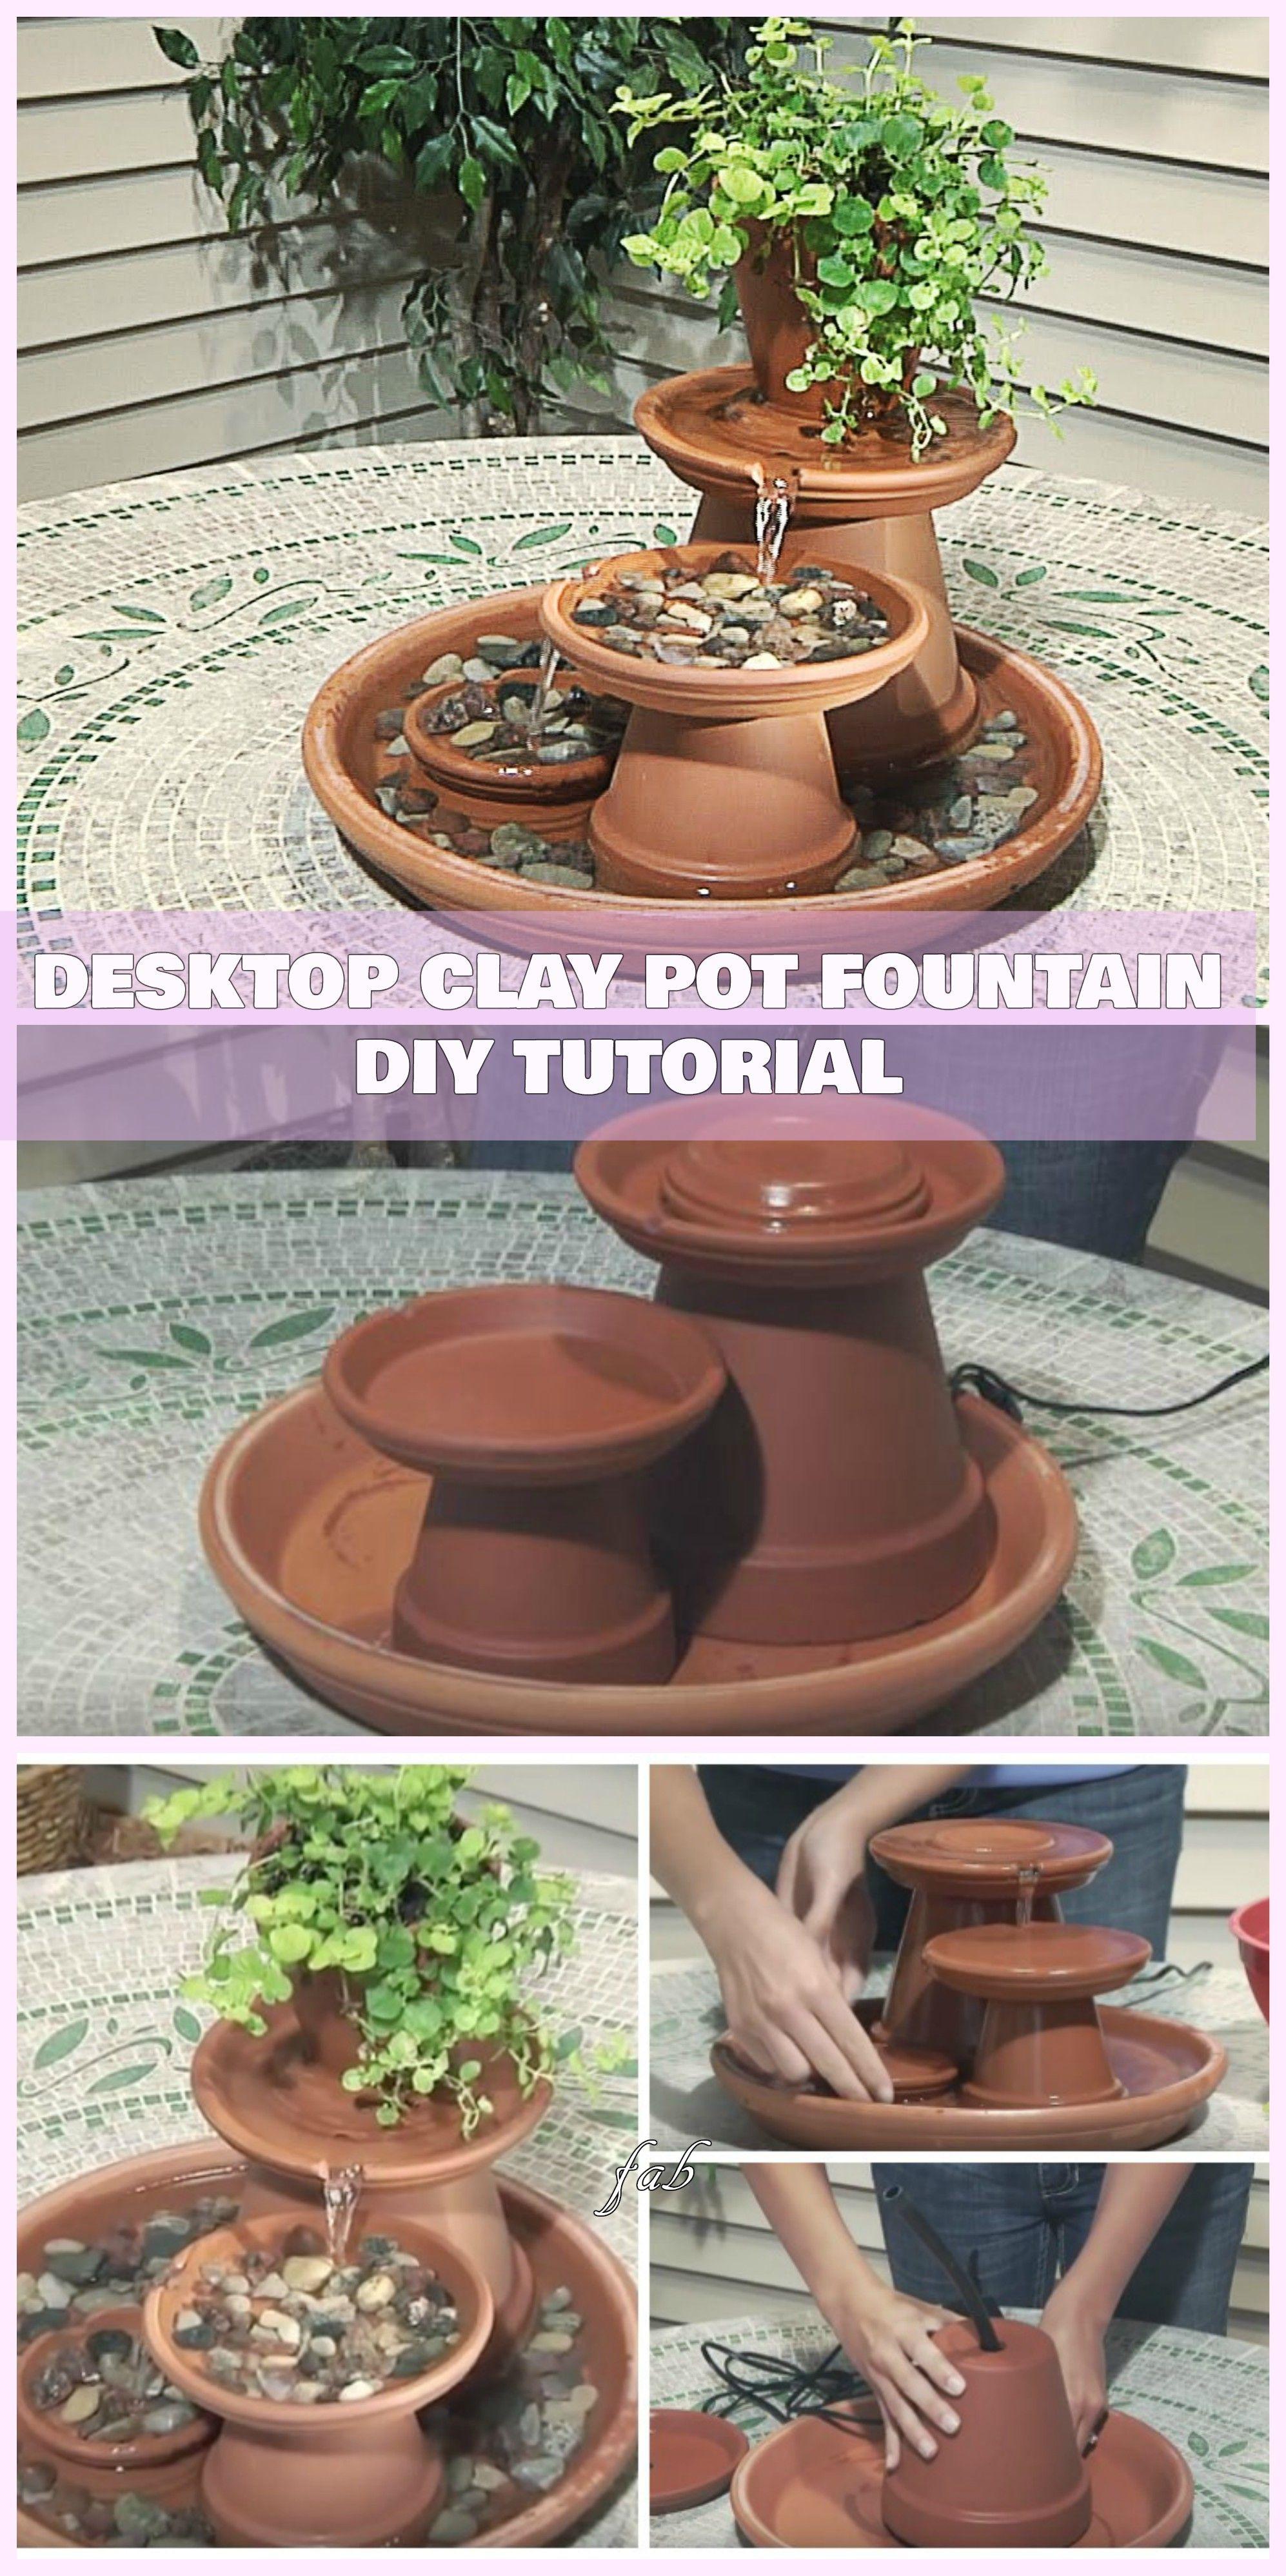 Diy terracotta clay pot fountain projects tutorials clay